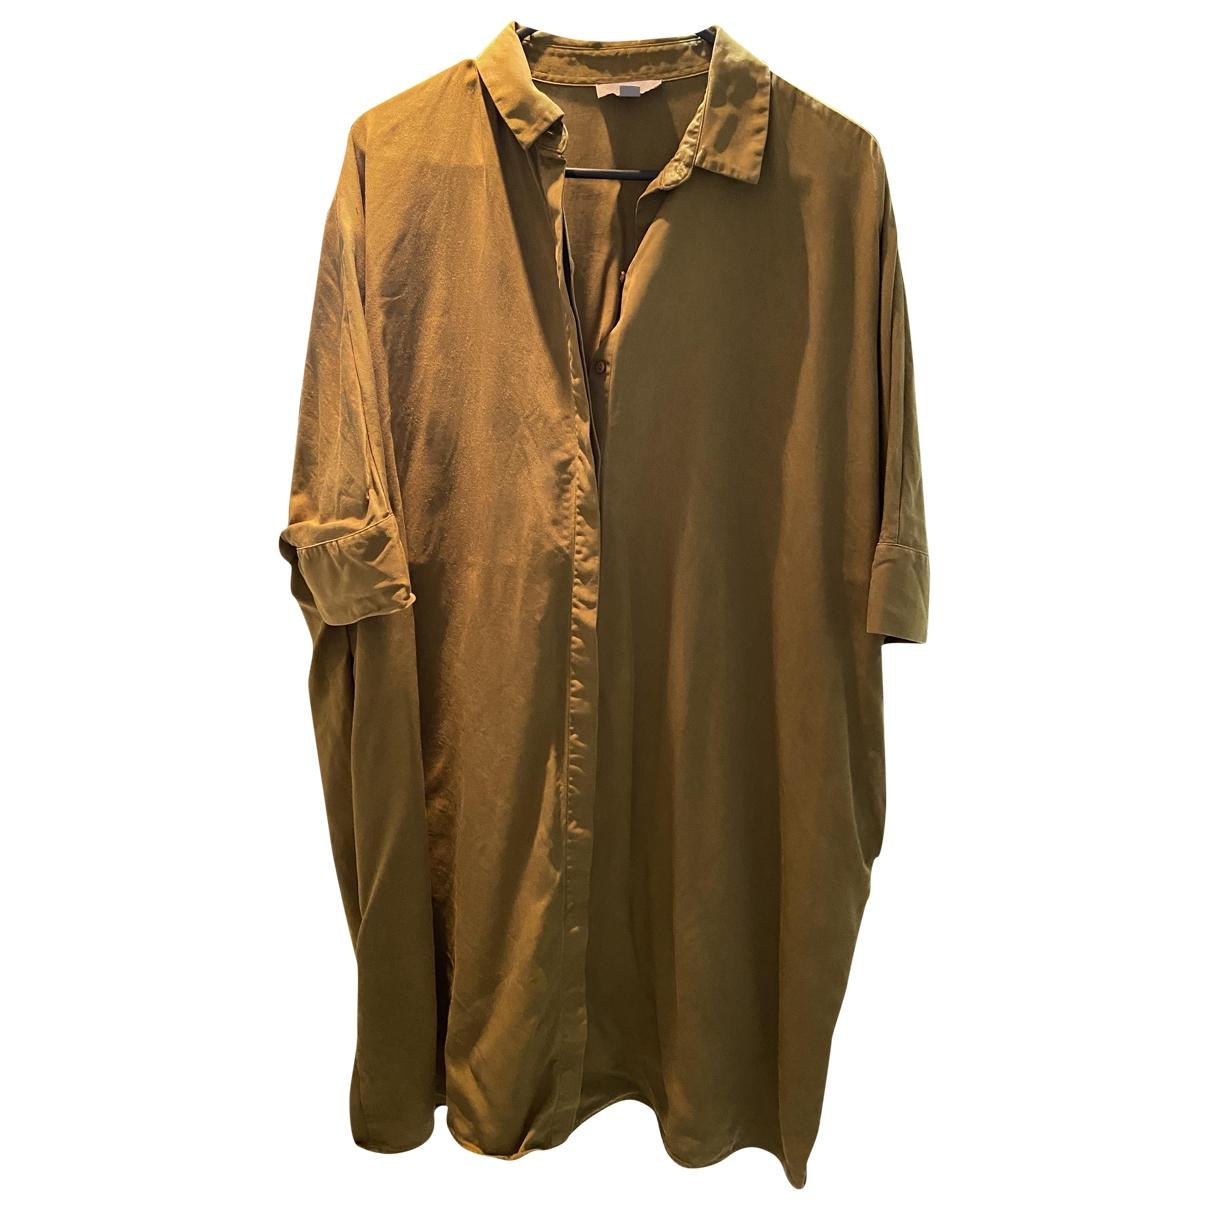 Cos \N Khaki Cotton  top for Women 34 FR